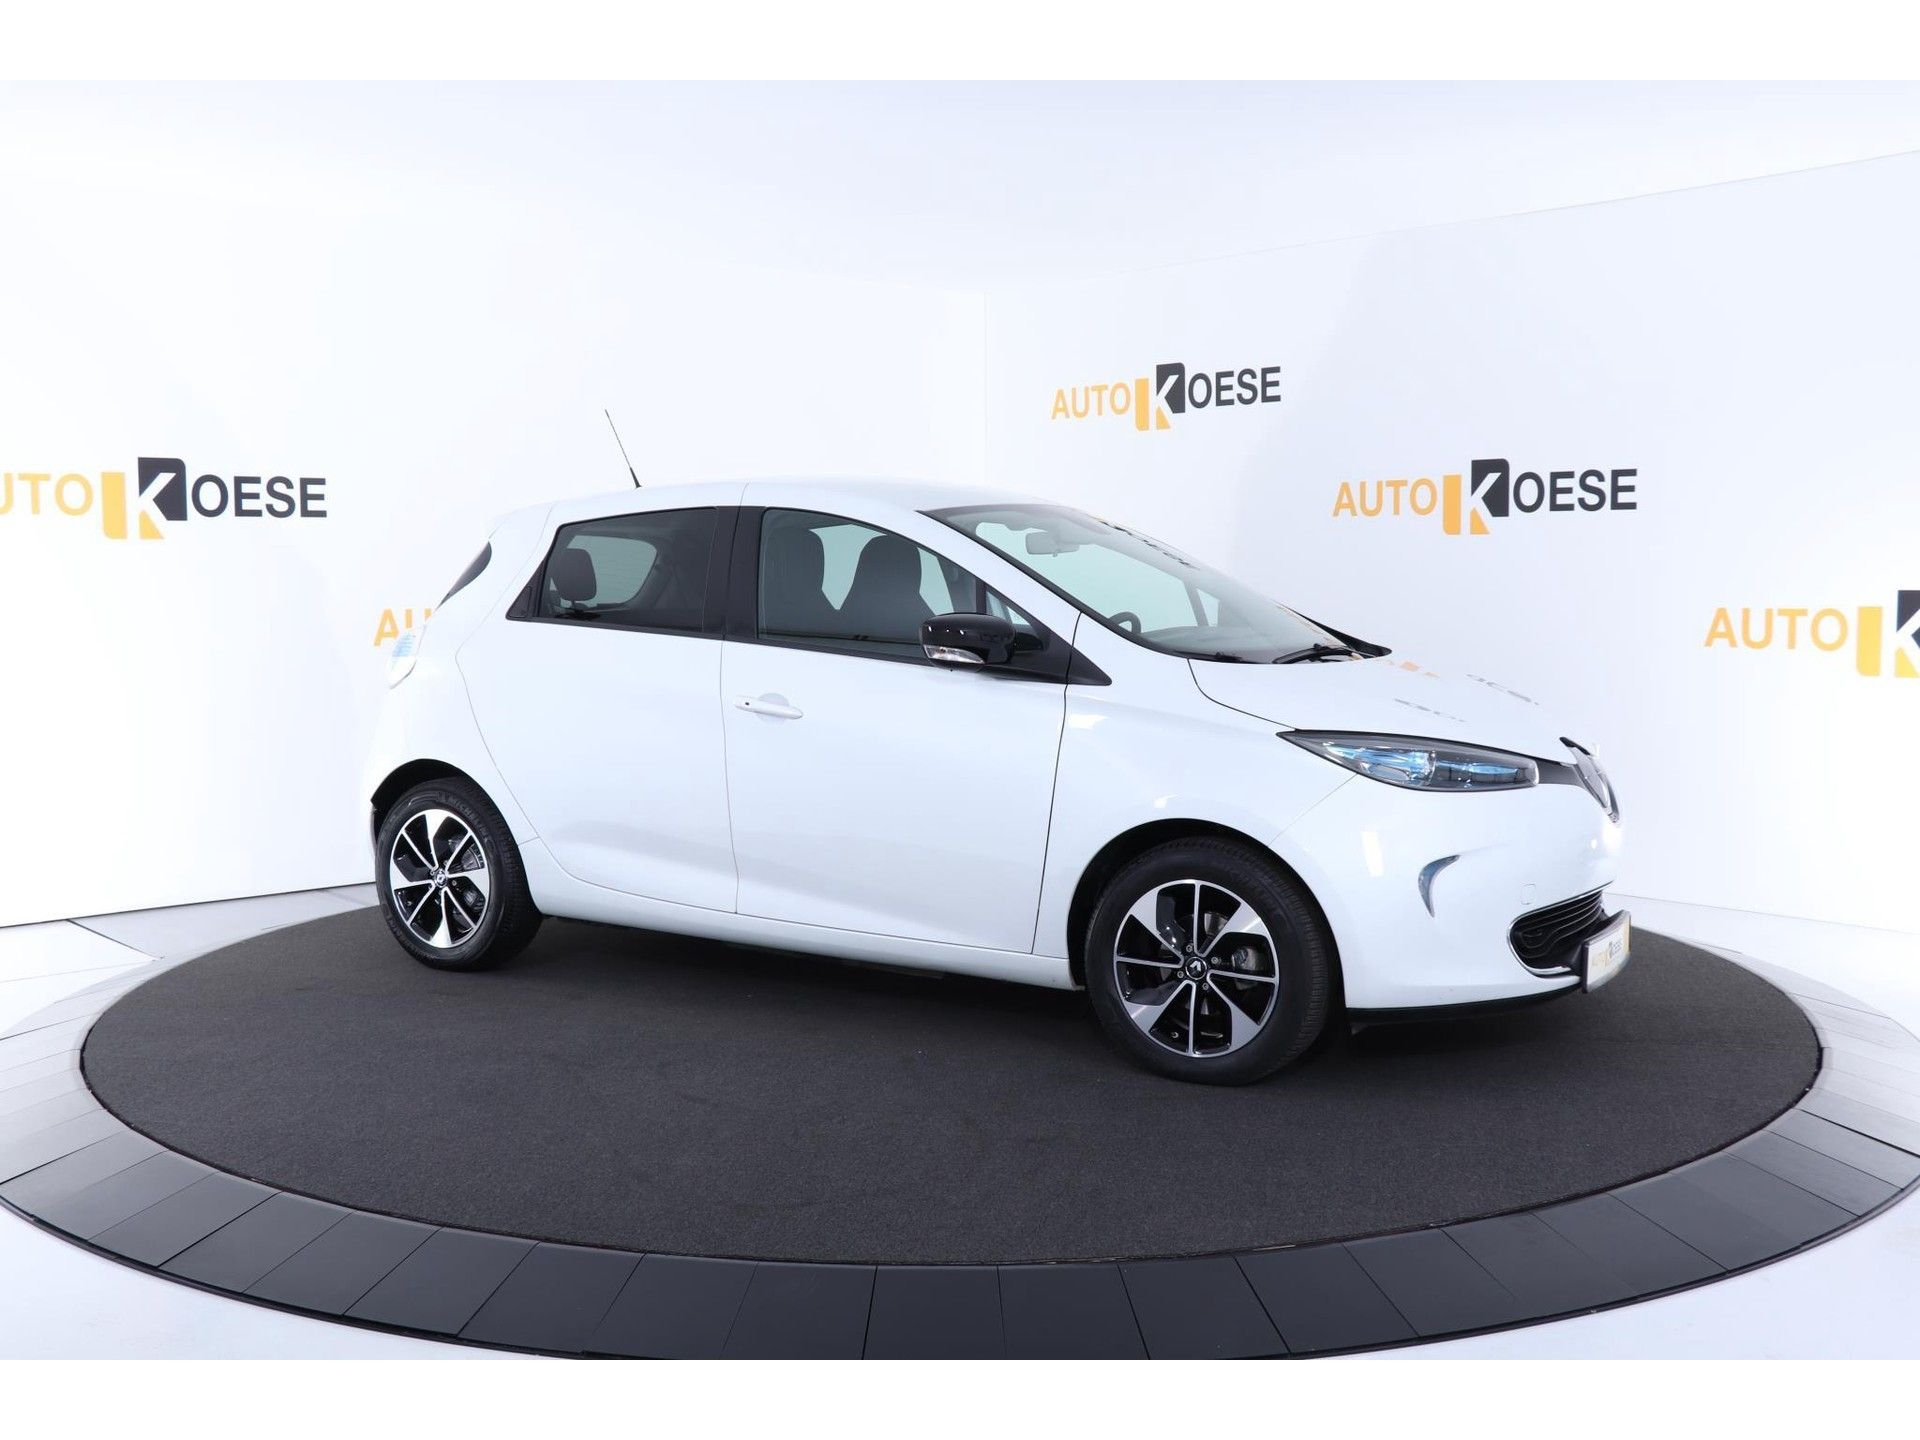 Renault Zoe R90 Intens 41 kWh PARTICULIERE PRIJS € 13.488,-